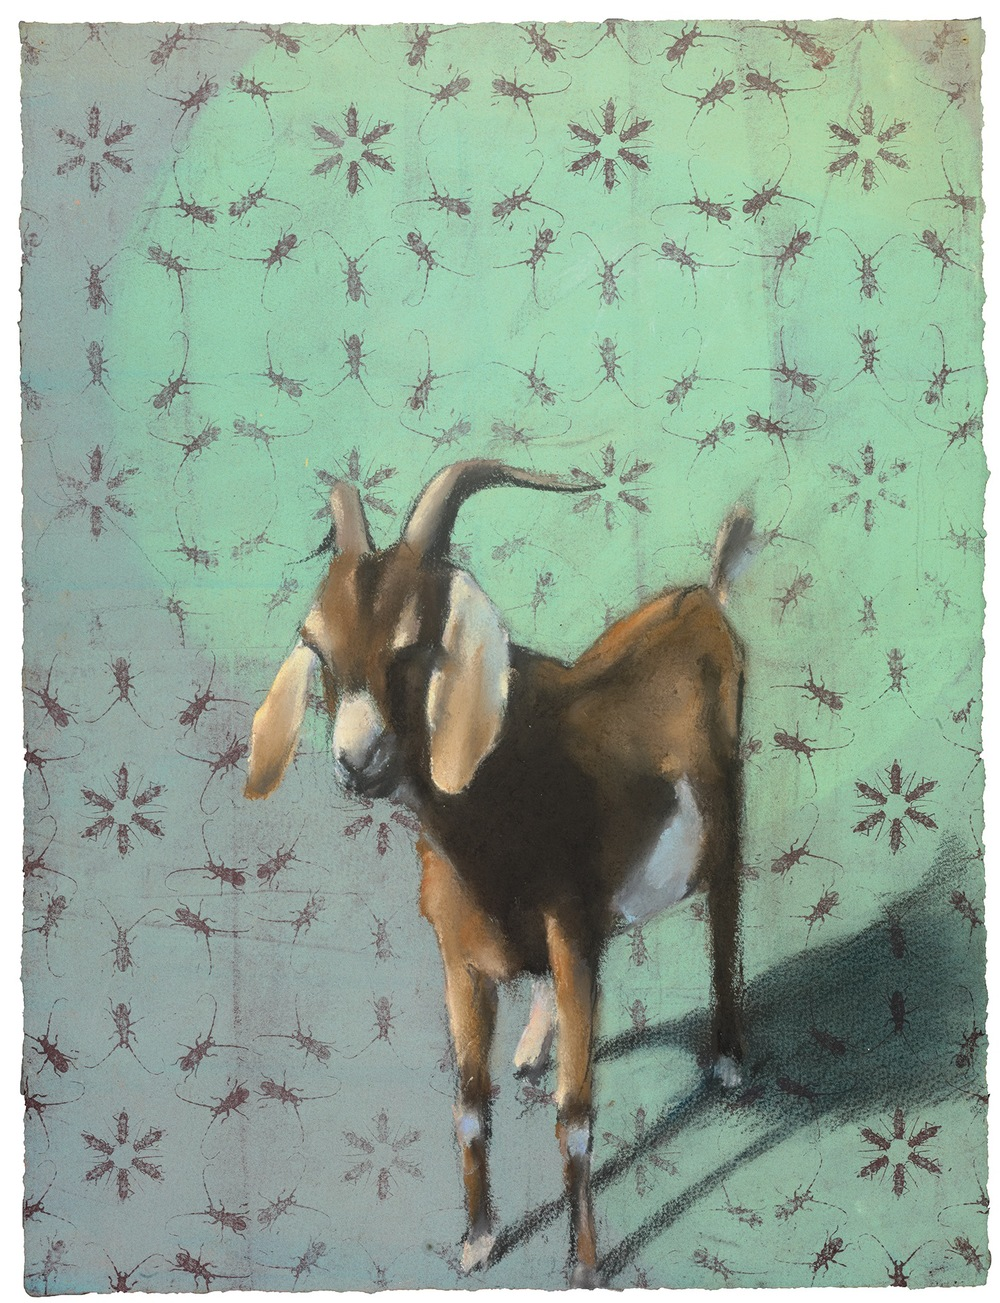 Goat #31